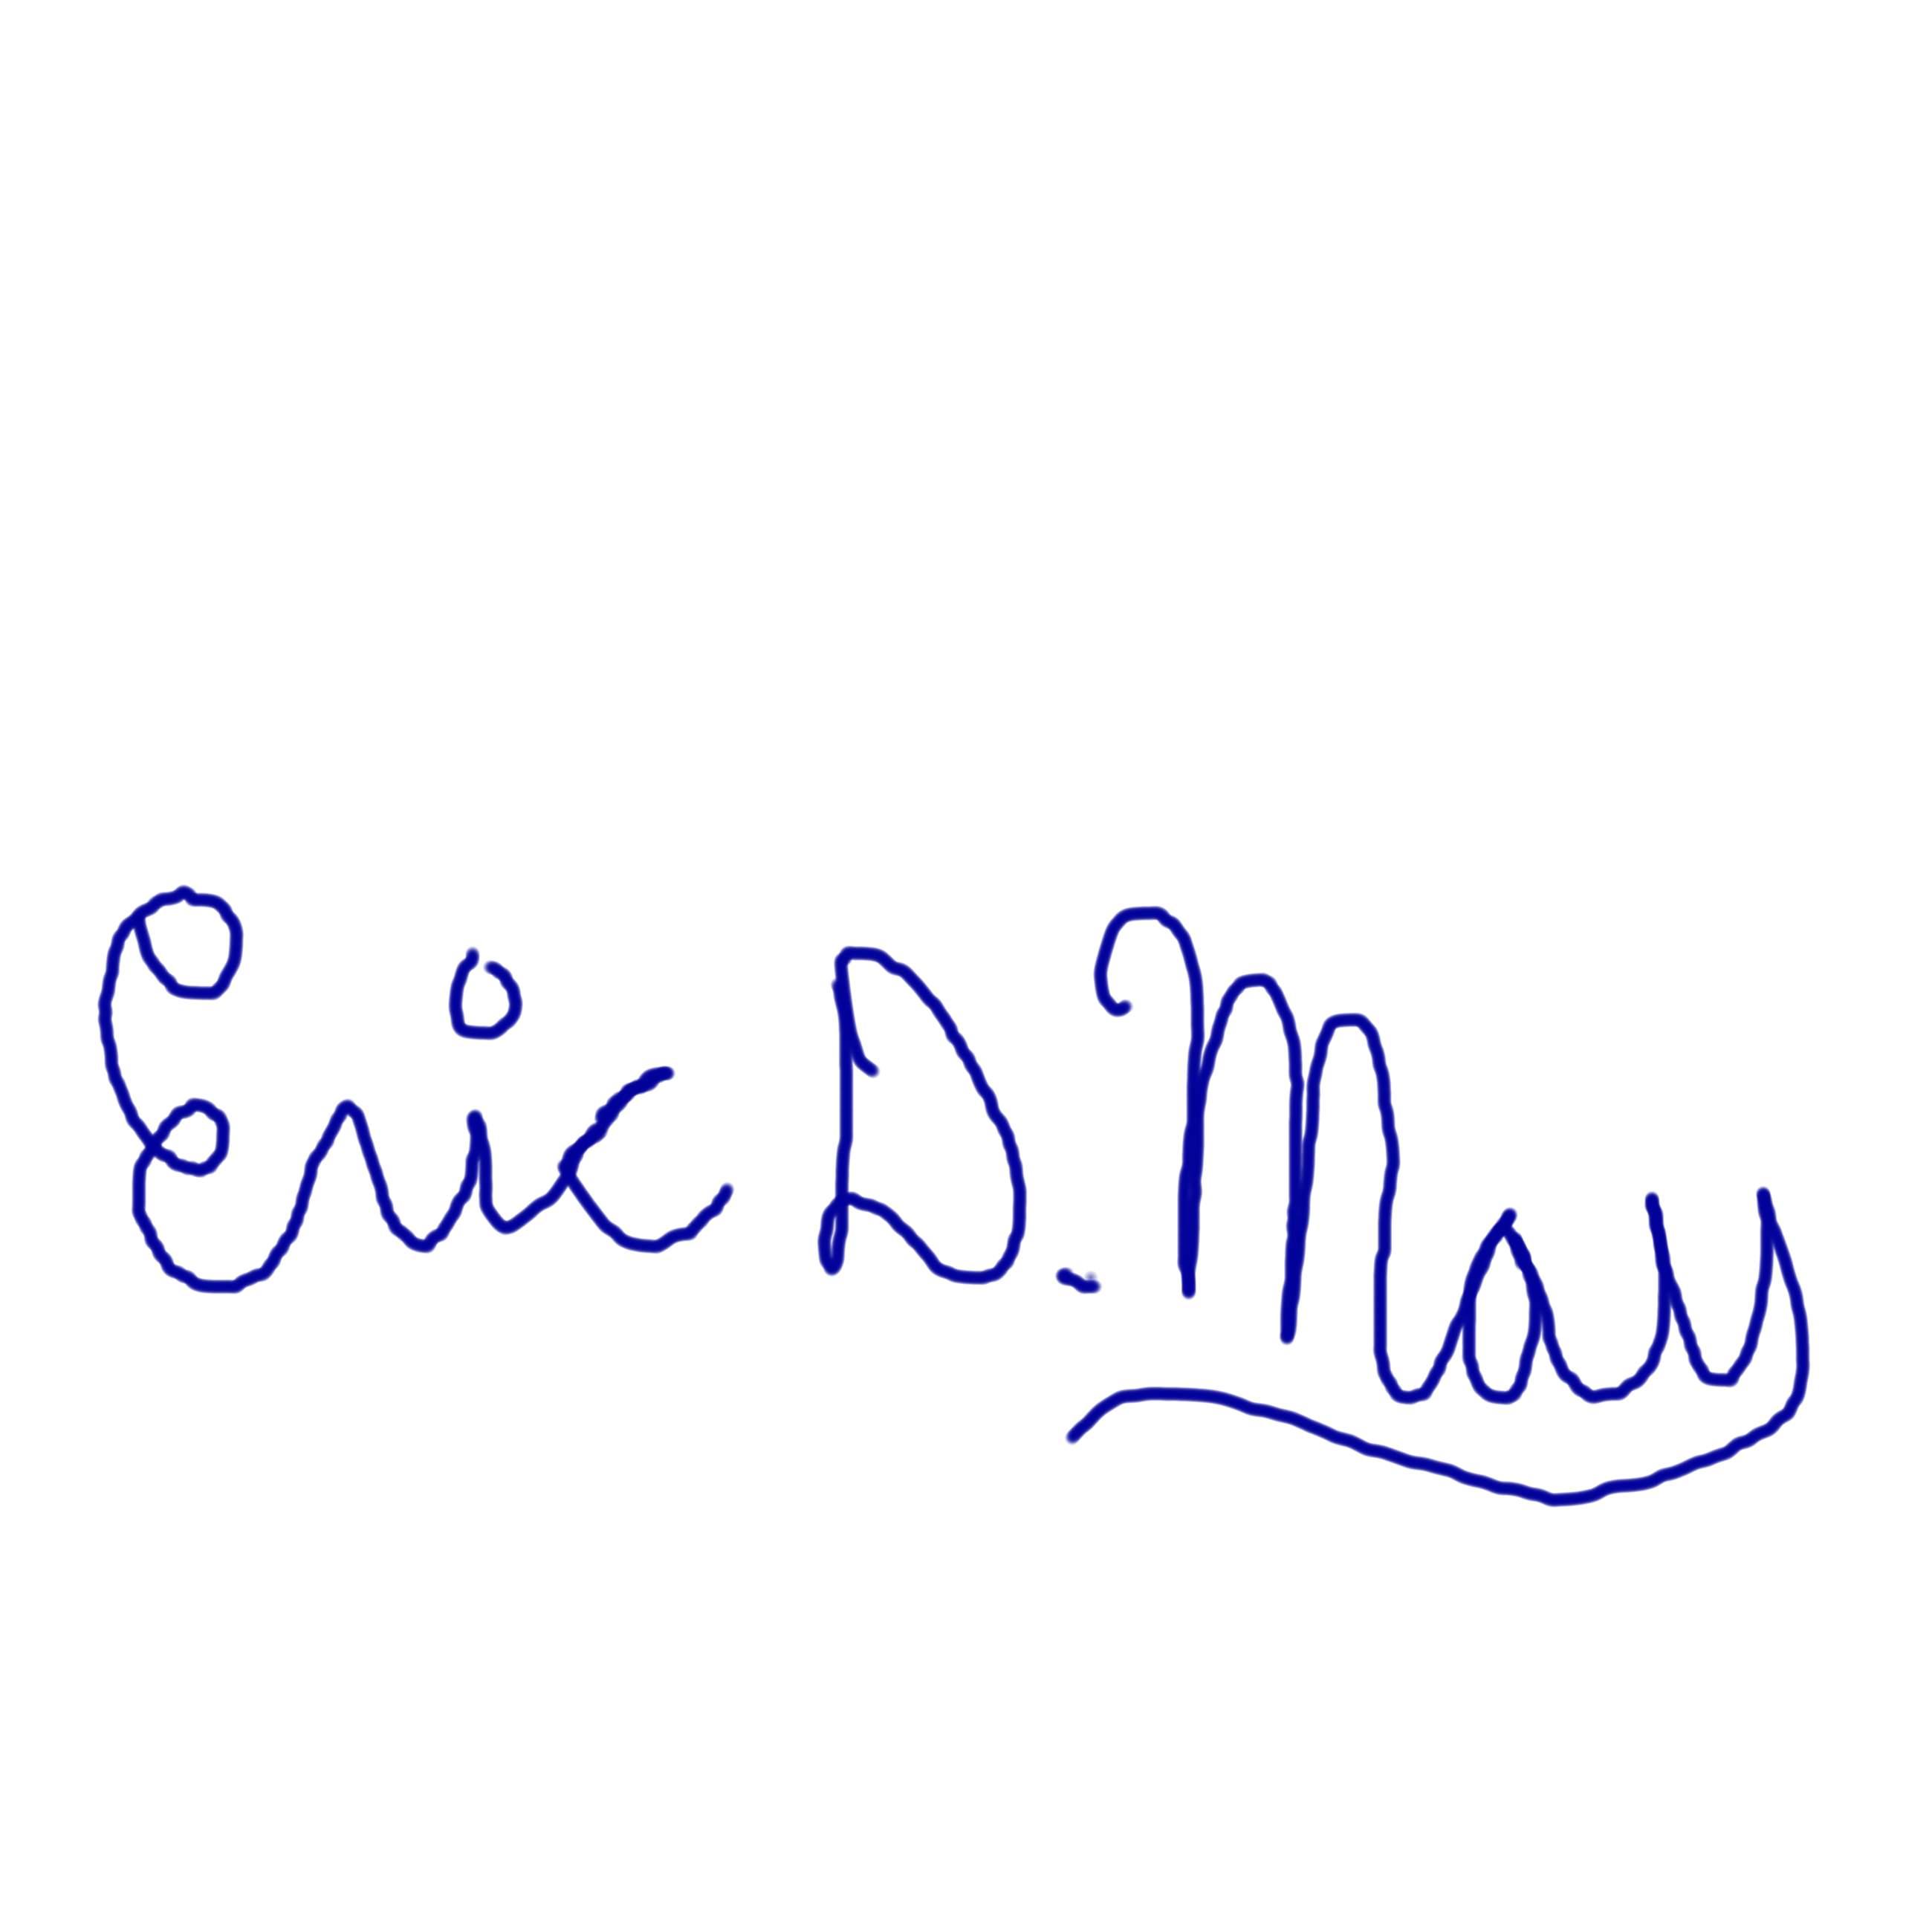 Eric May's Signature